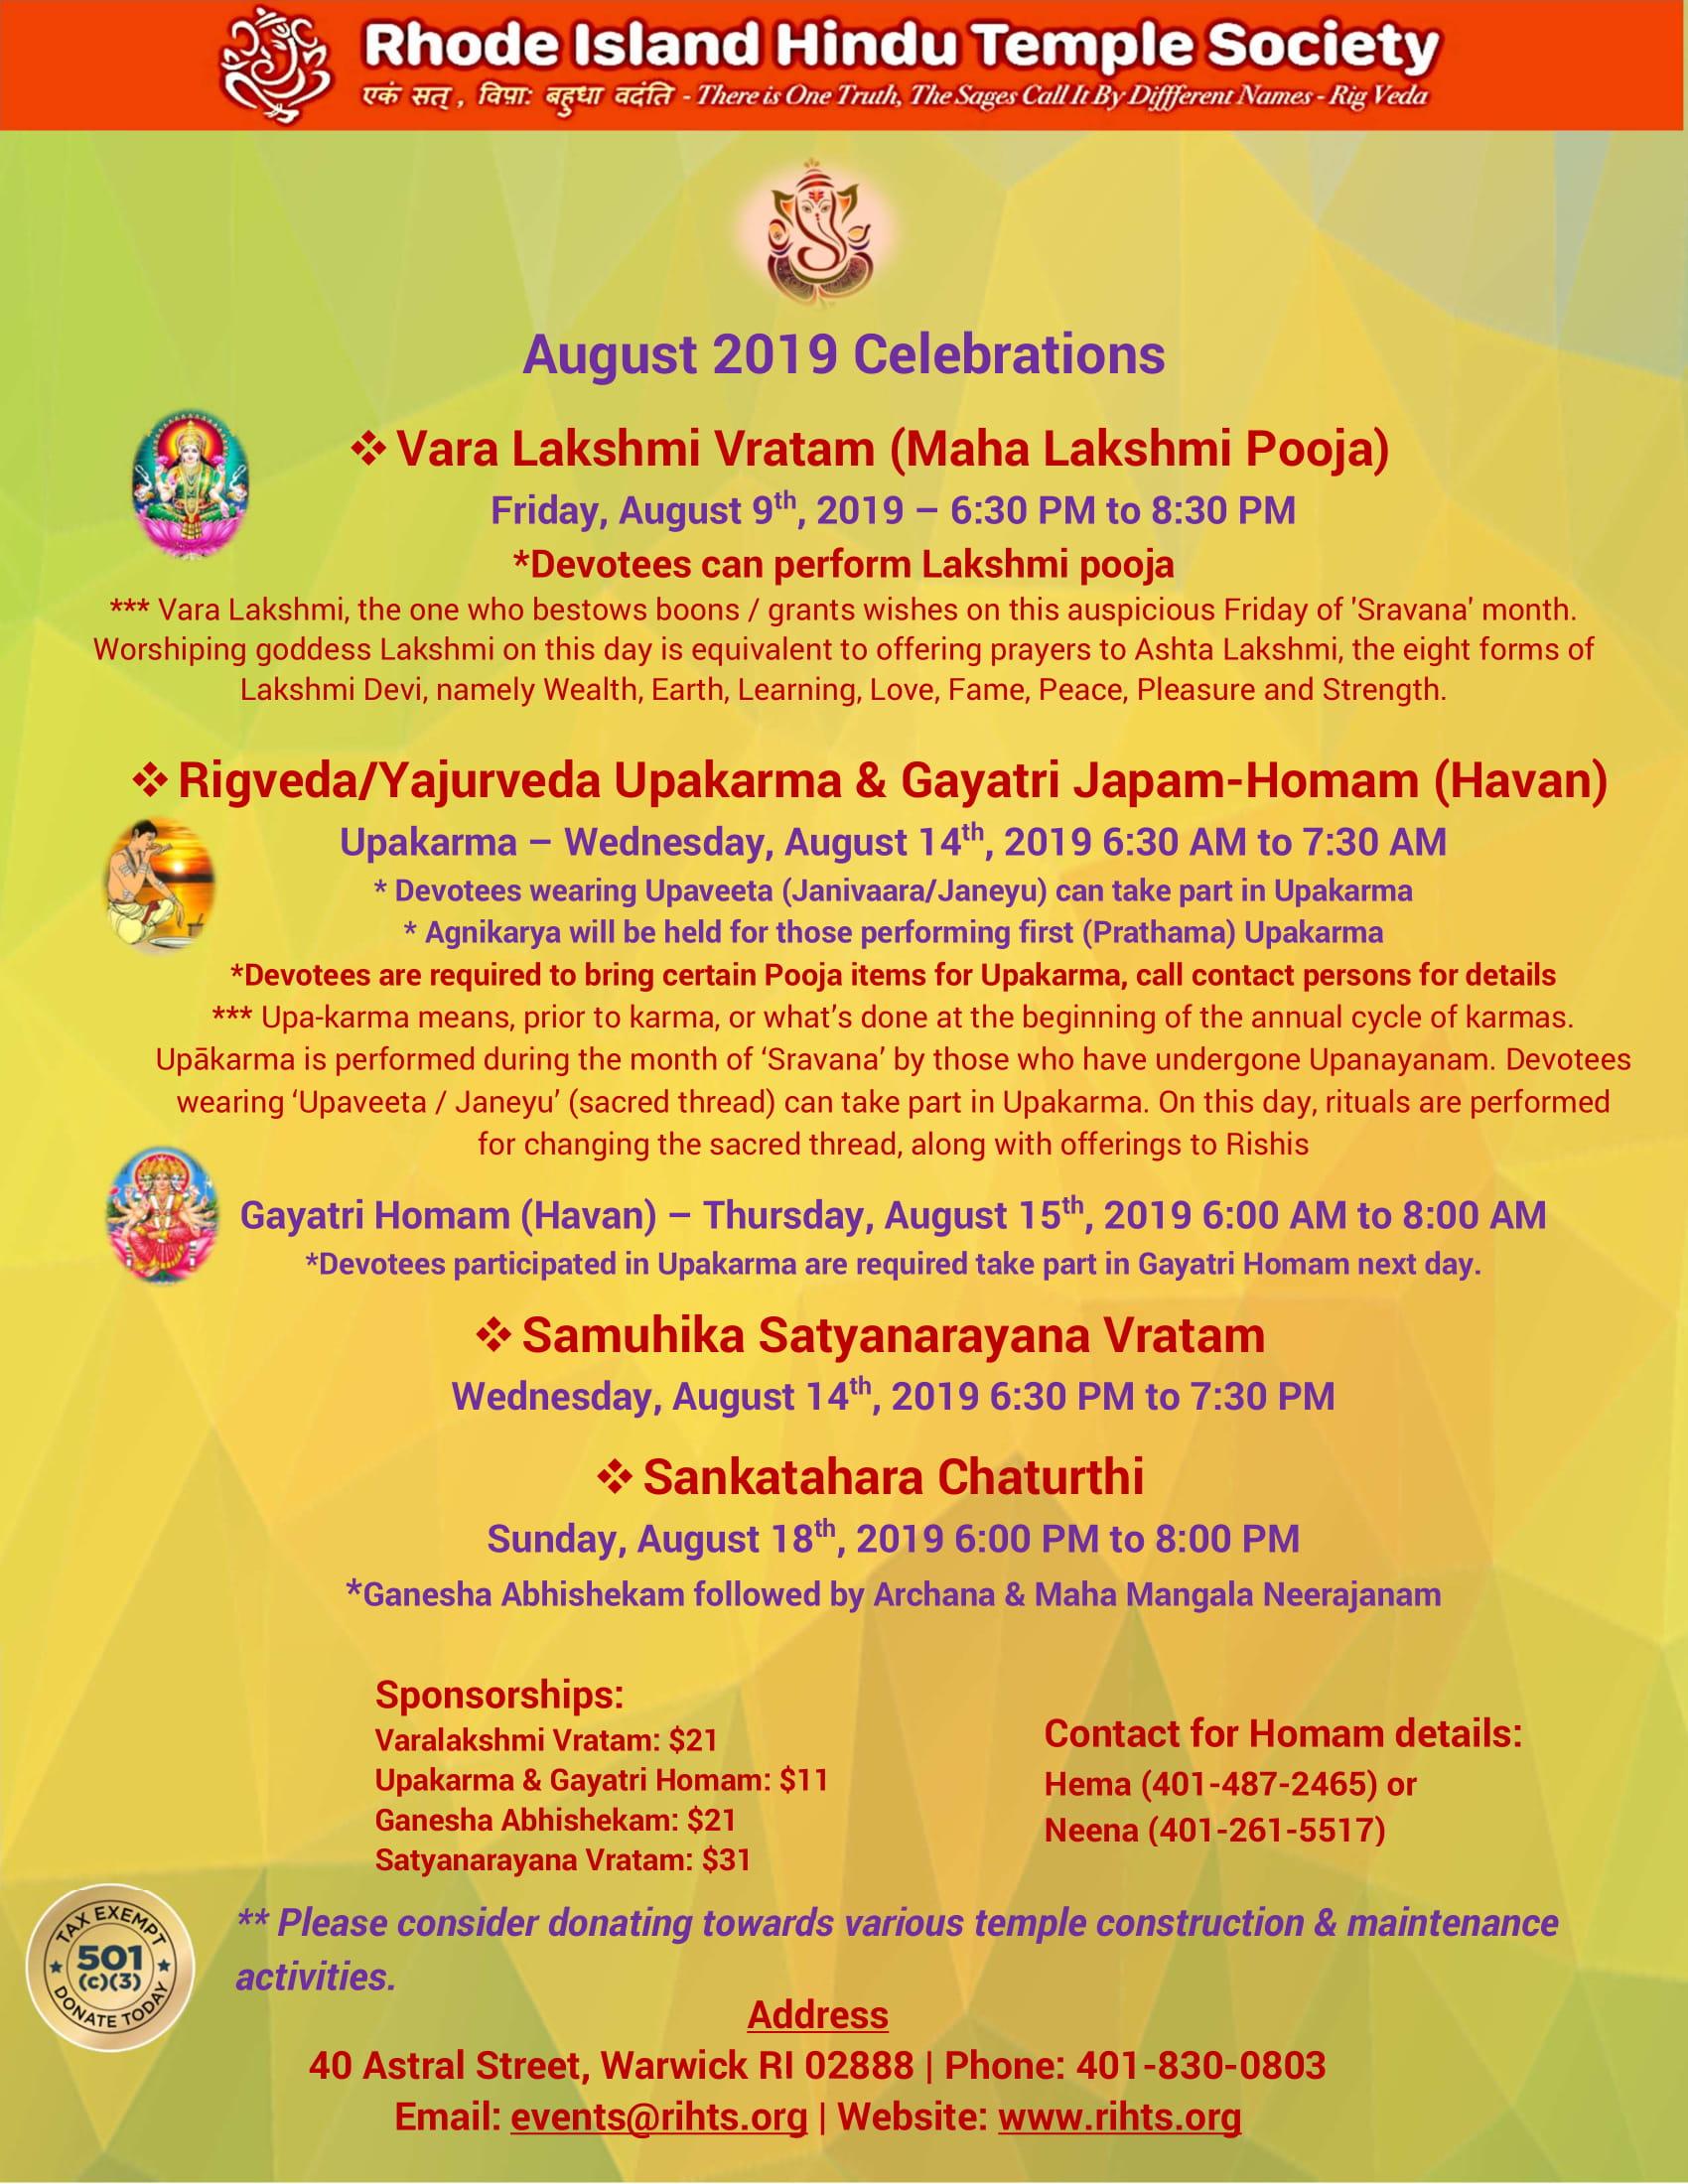 Temple Events – Rhode Island Hindu Temple Society